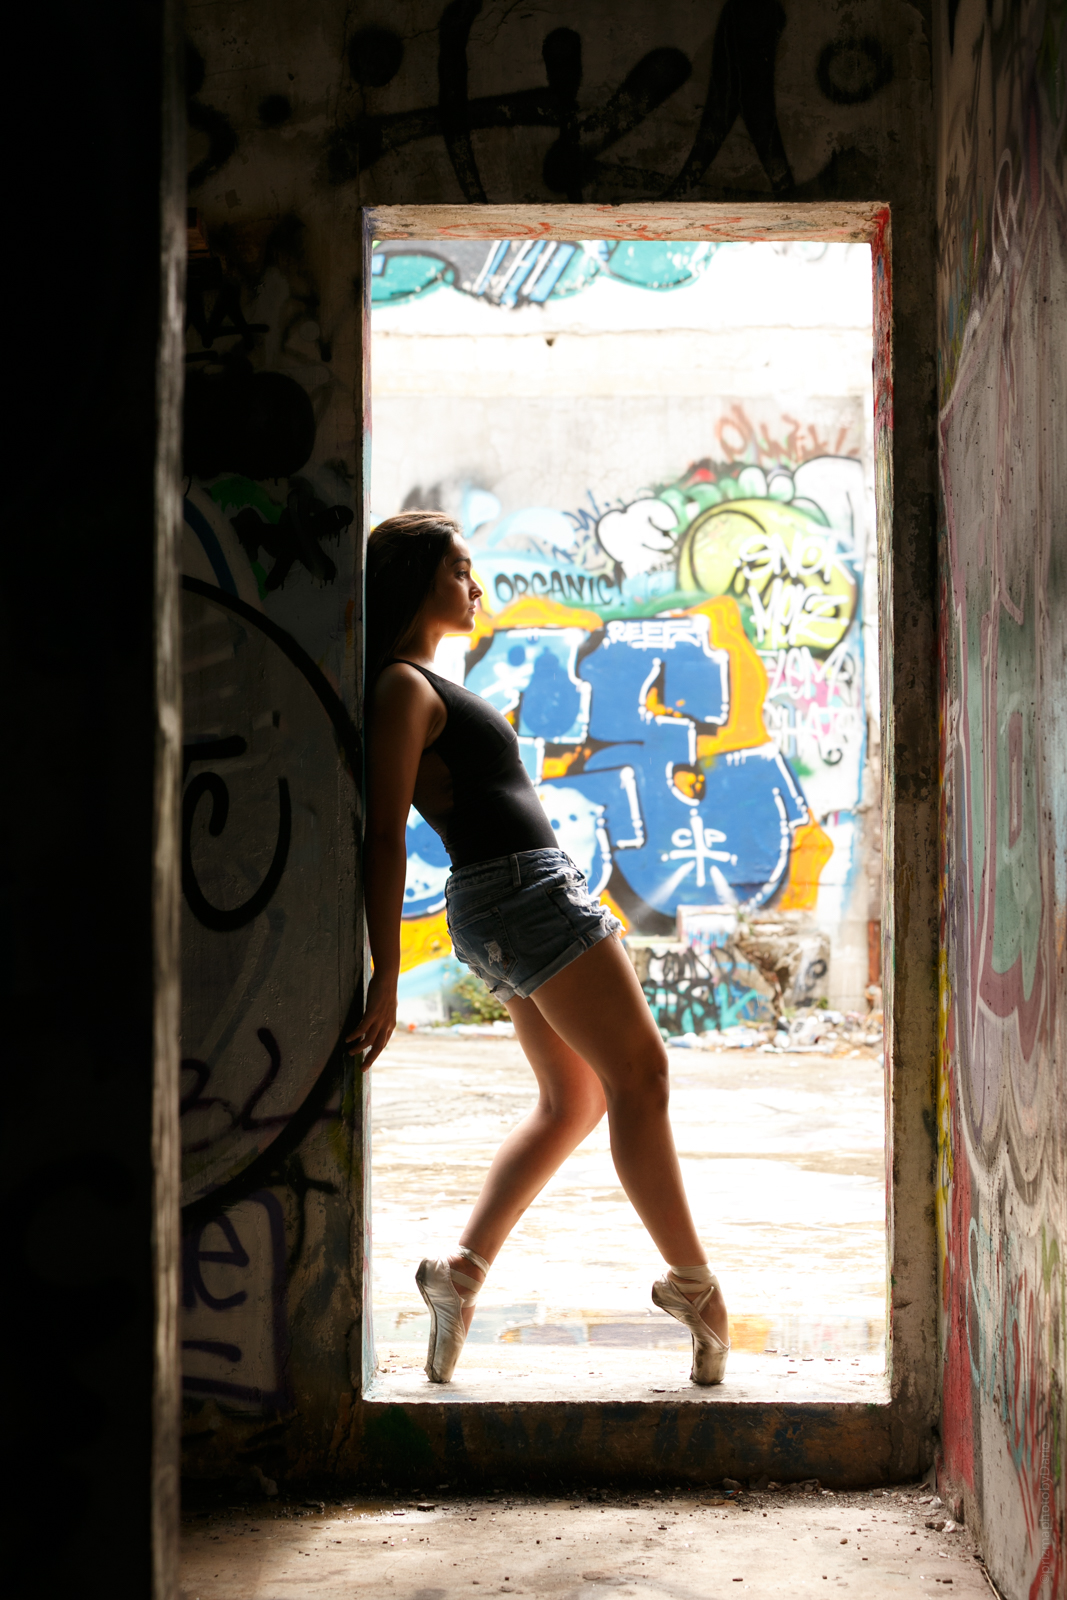 DM00167©prizmaphotobyDario